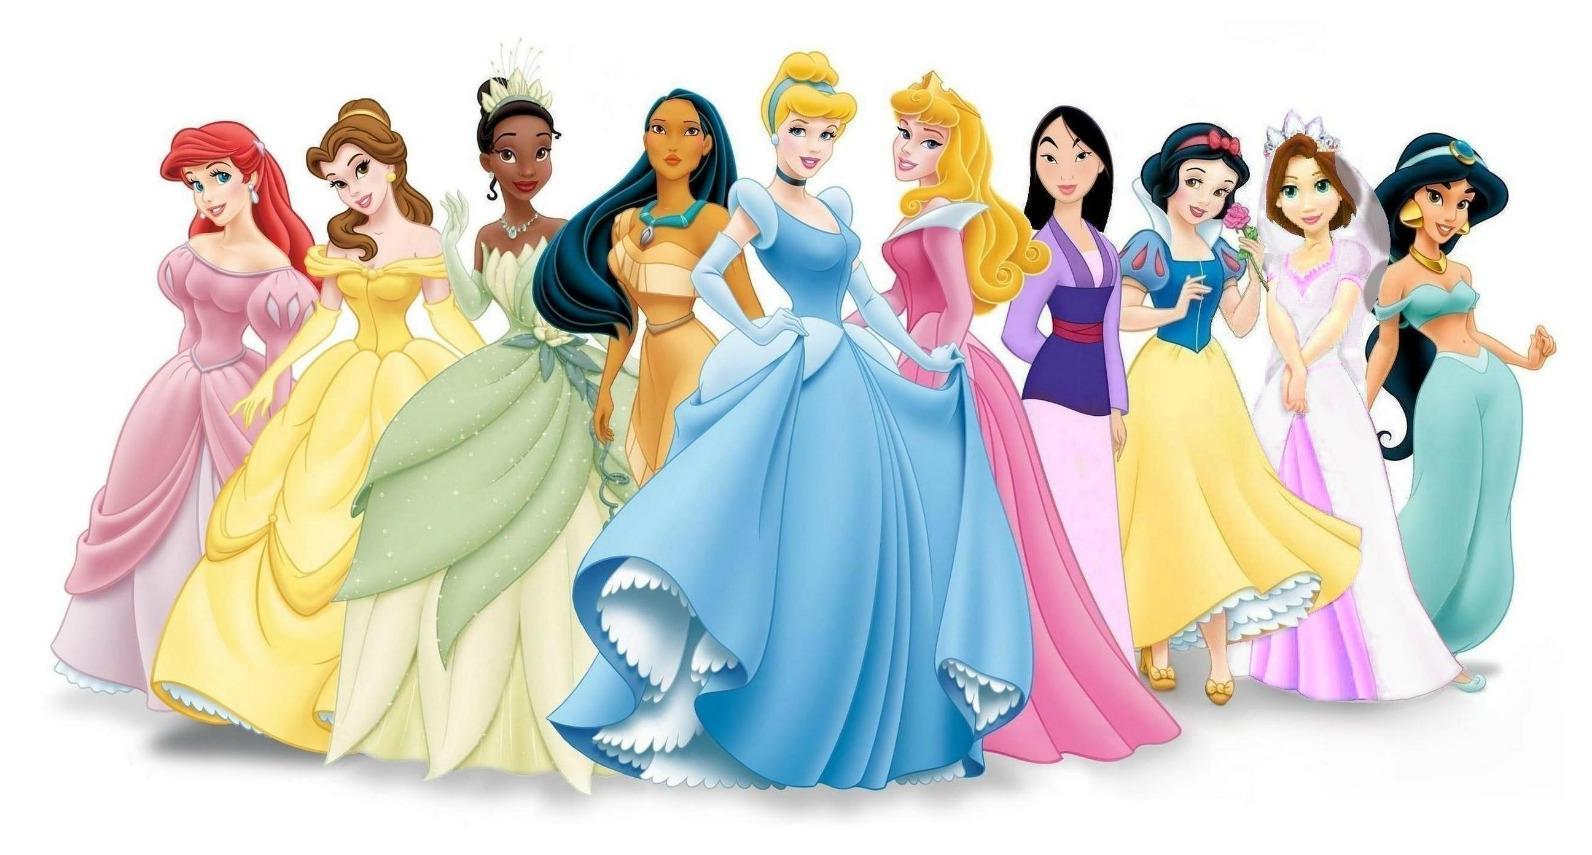 Disney Princesses Names 2012 Disney_princesses_wedding.jpg